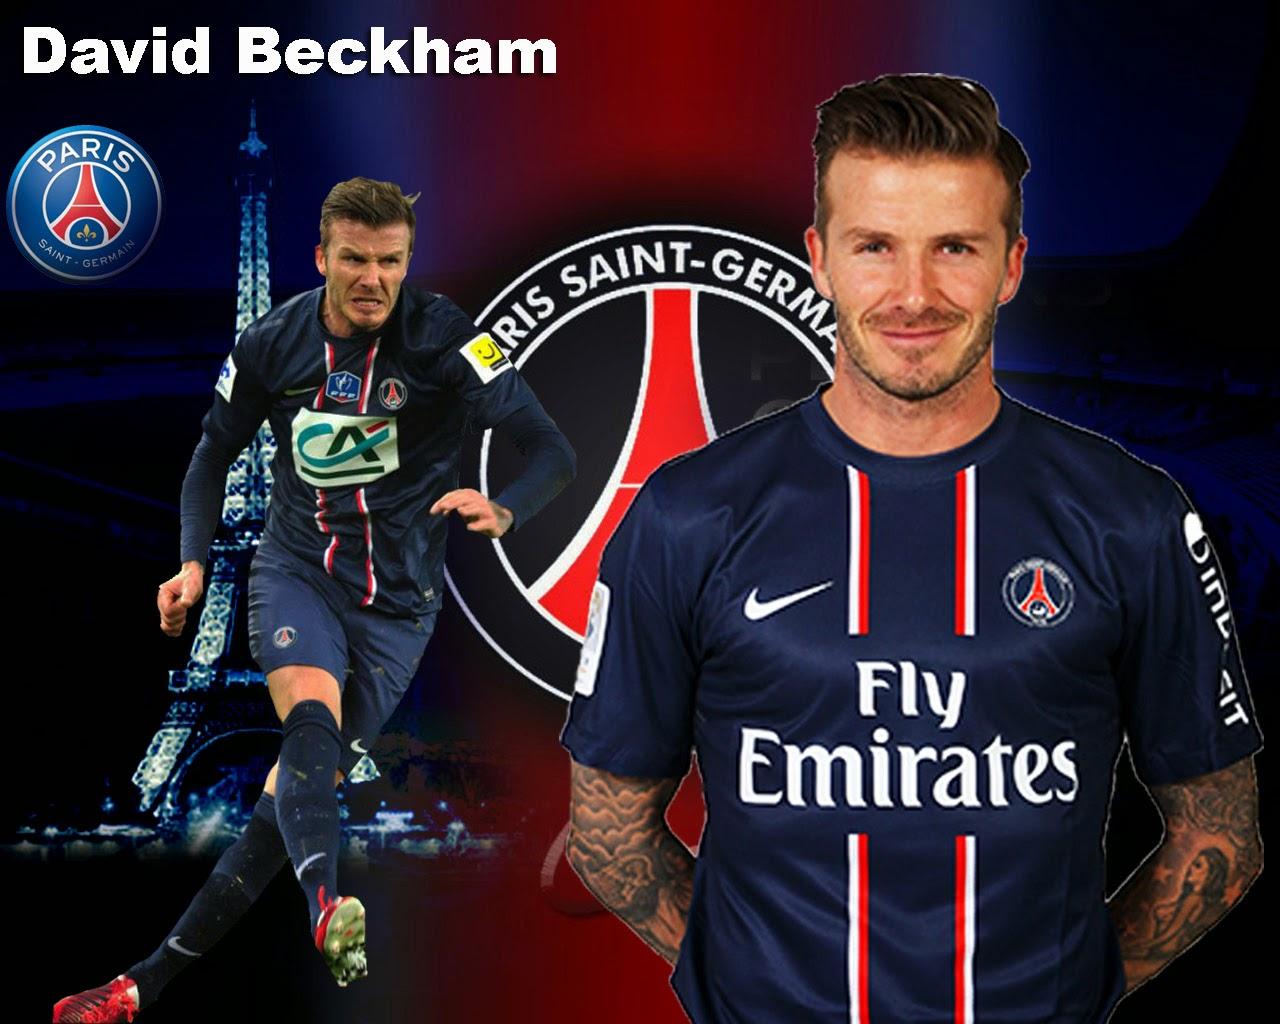 The Best Player Soccer Top Crazy Skill David Beckham Paris Saint Germain